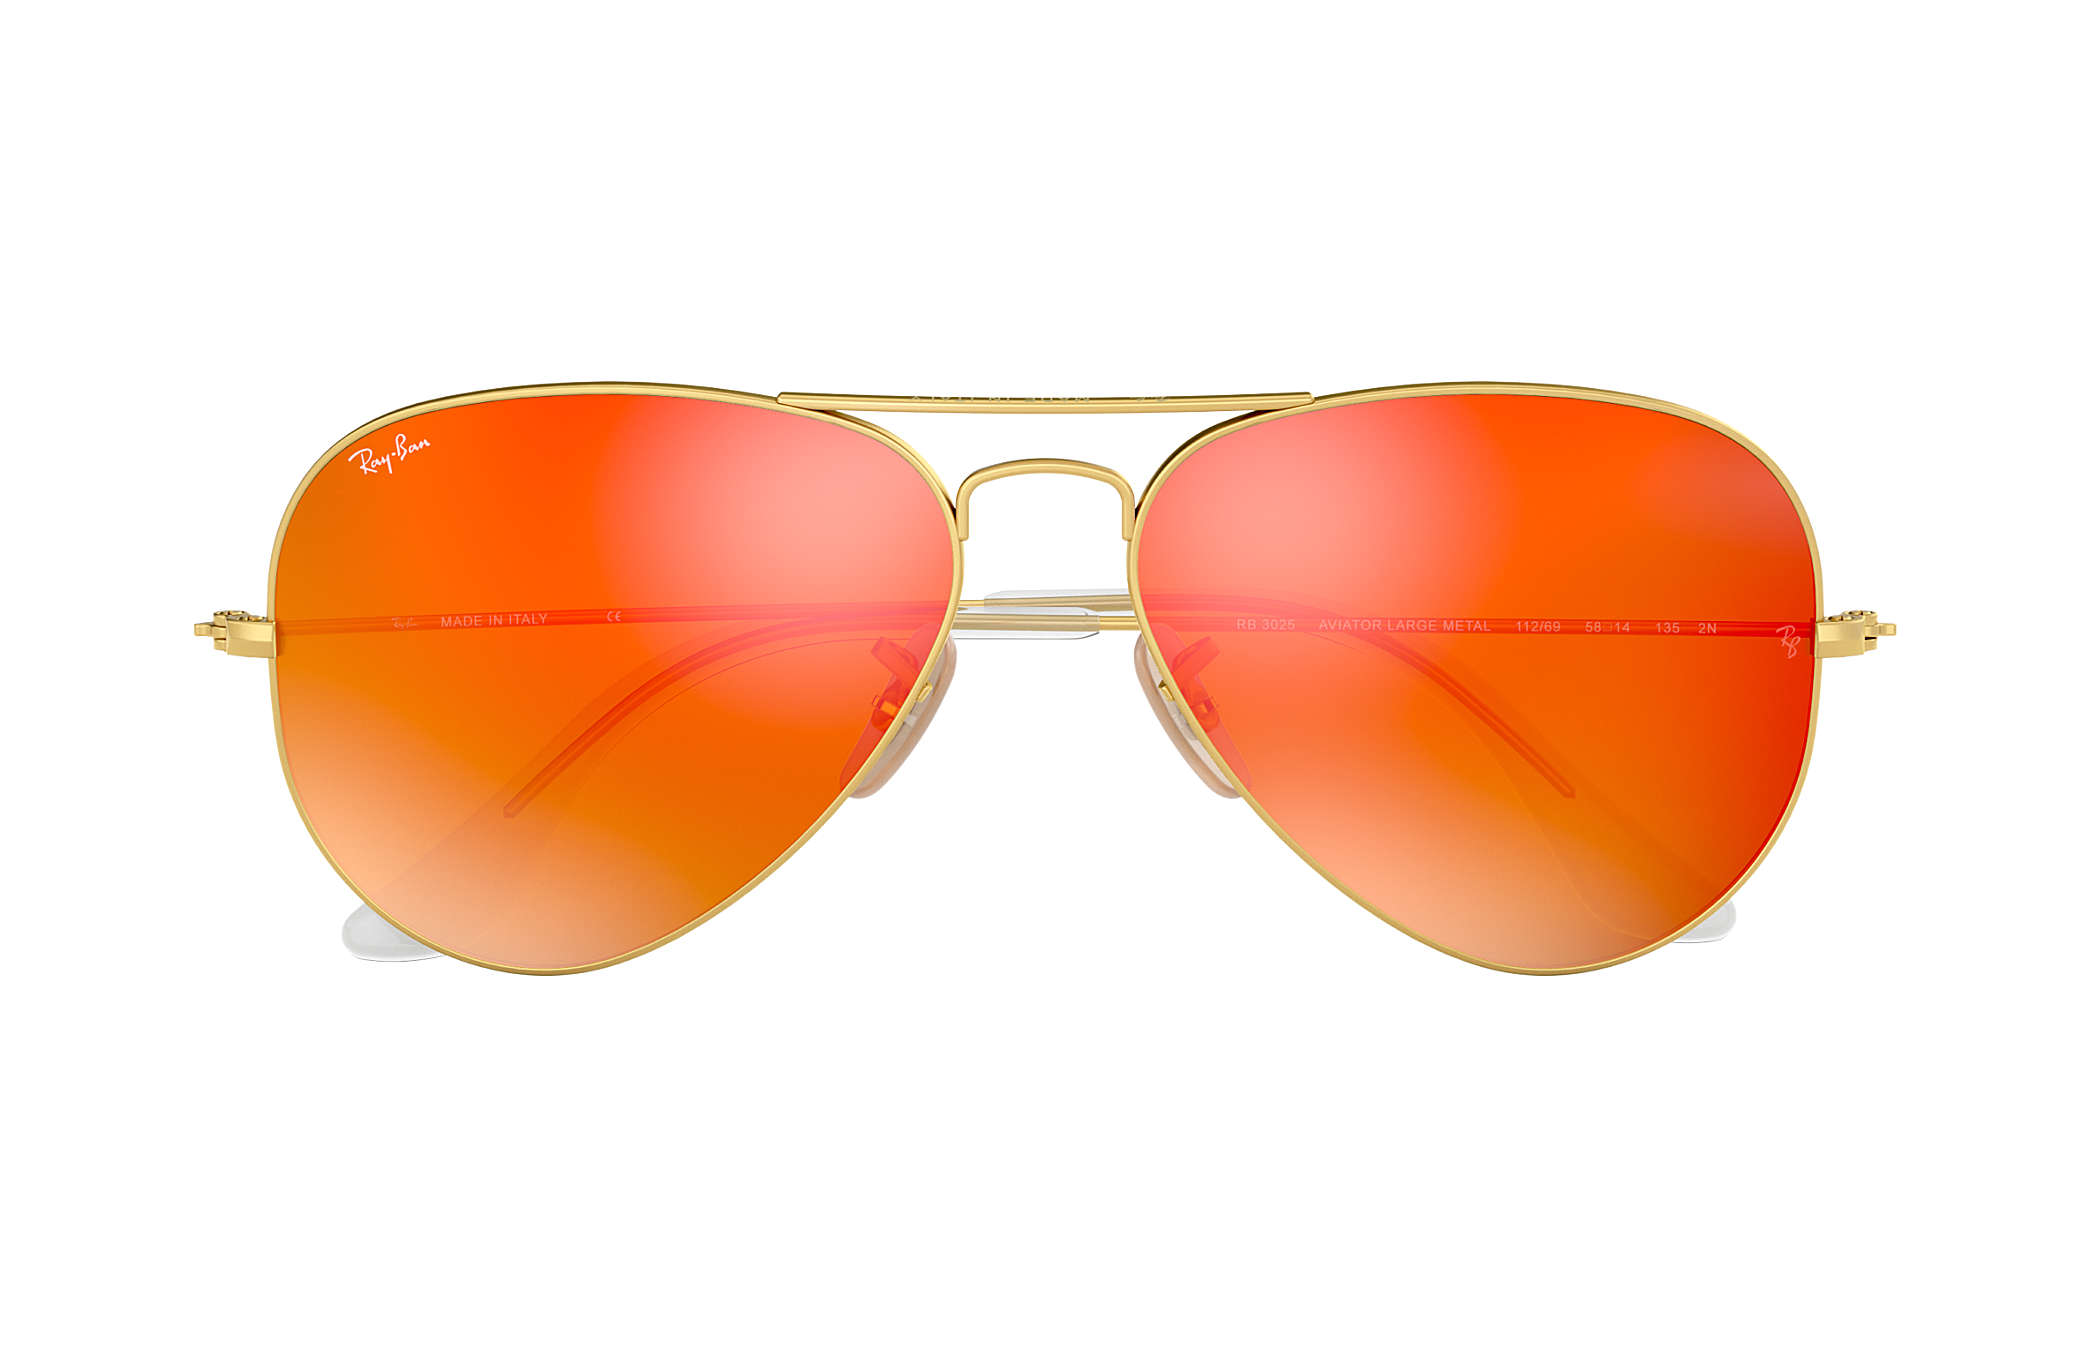 0ff9cfda0da Ray-Ban Aviator Flash Lenses RB3025 Gold - Metal - Orange Lenses ...